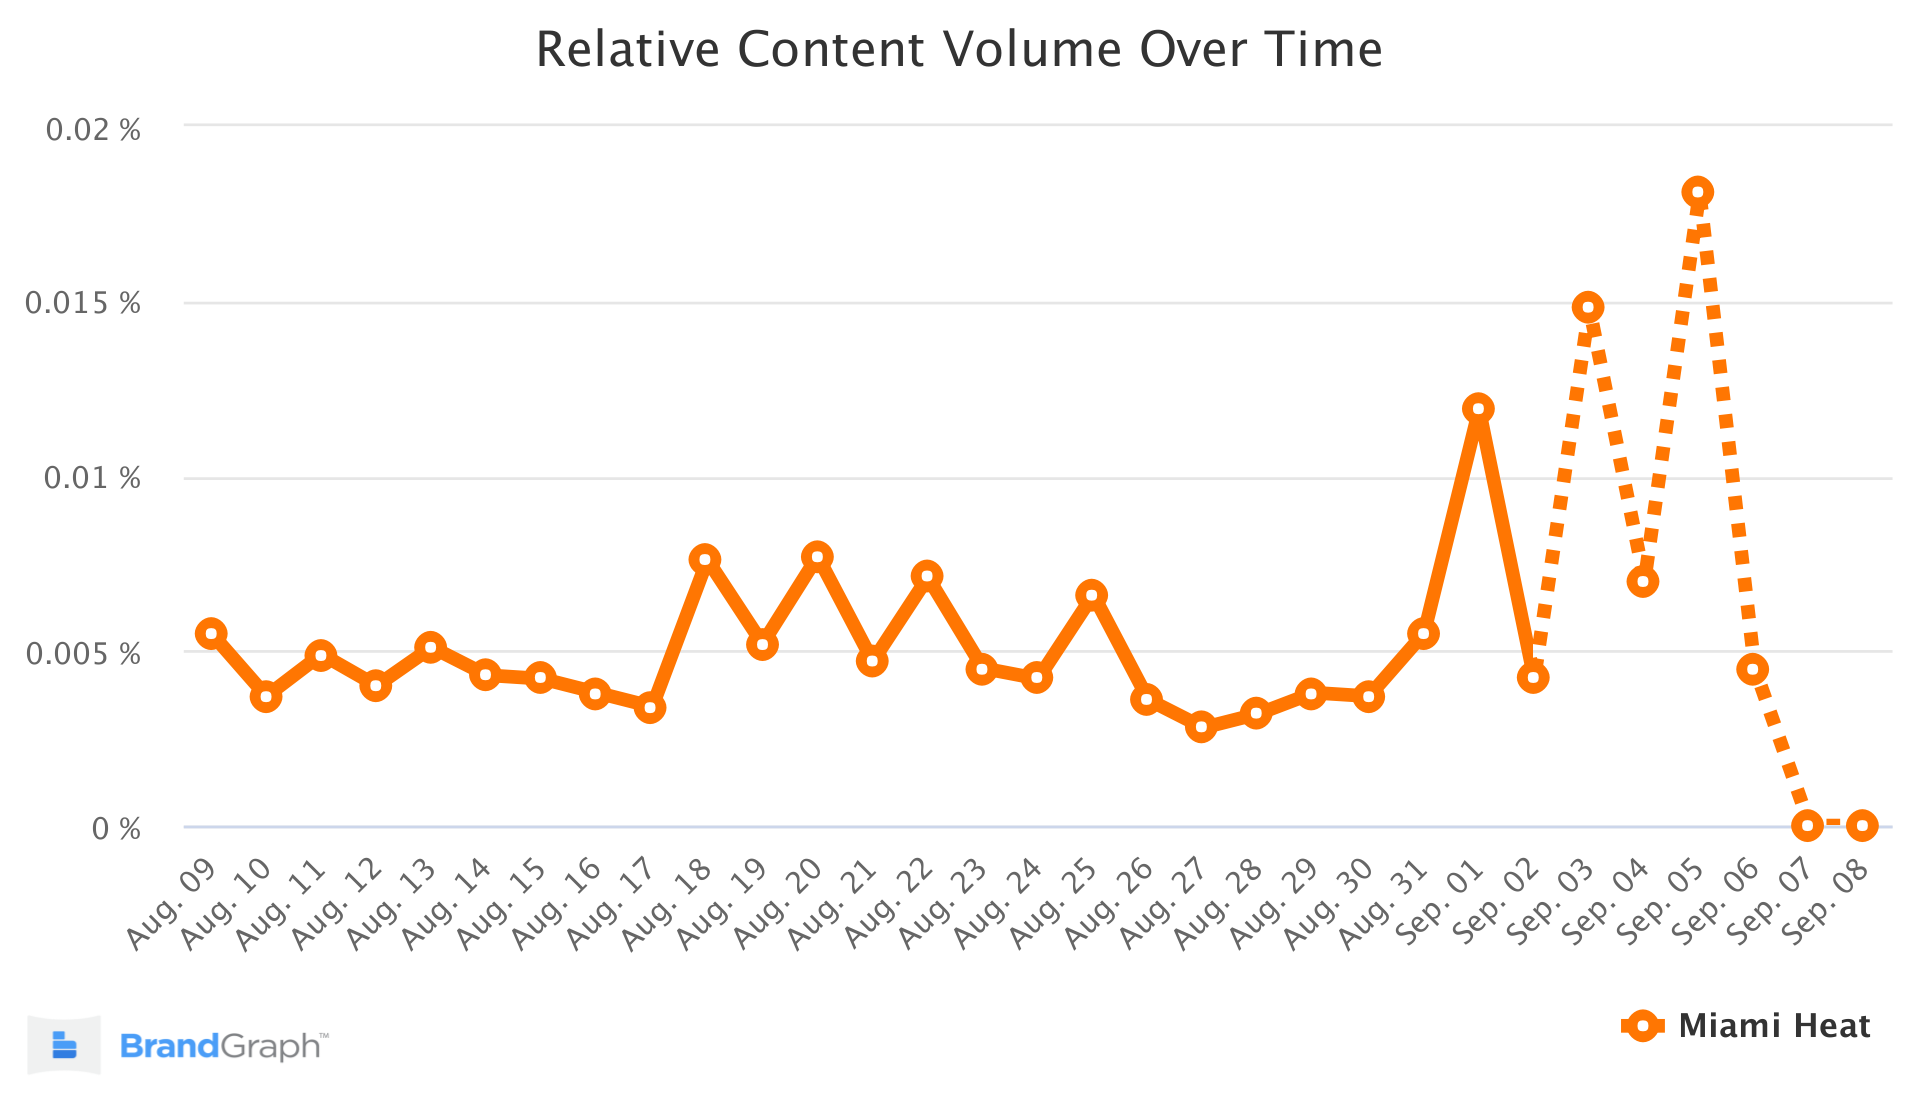 miami heat brandgraph trend chart